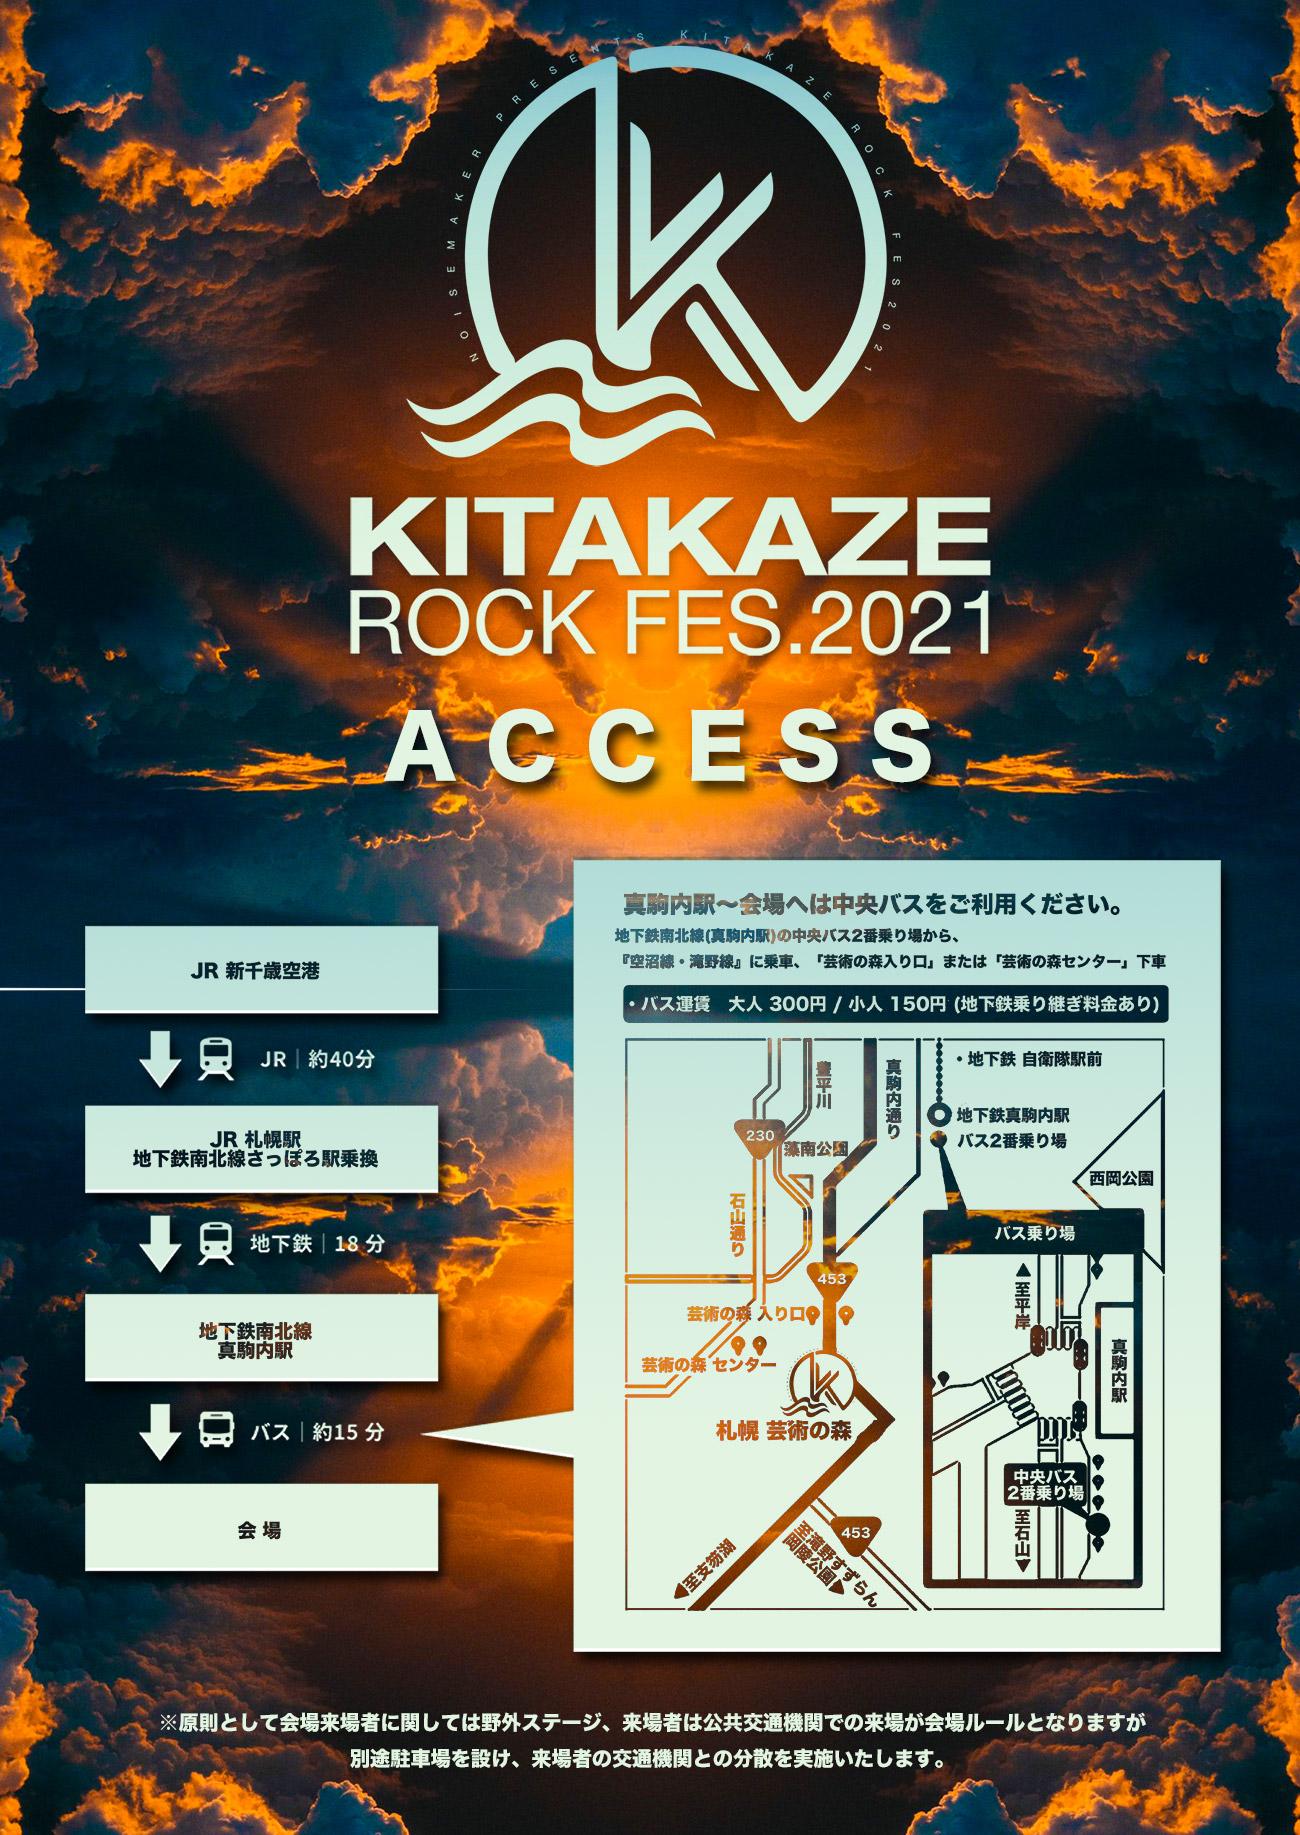 KITAKAZE ROCK FES. 2021